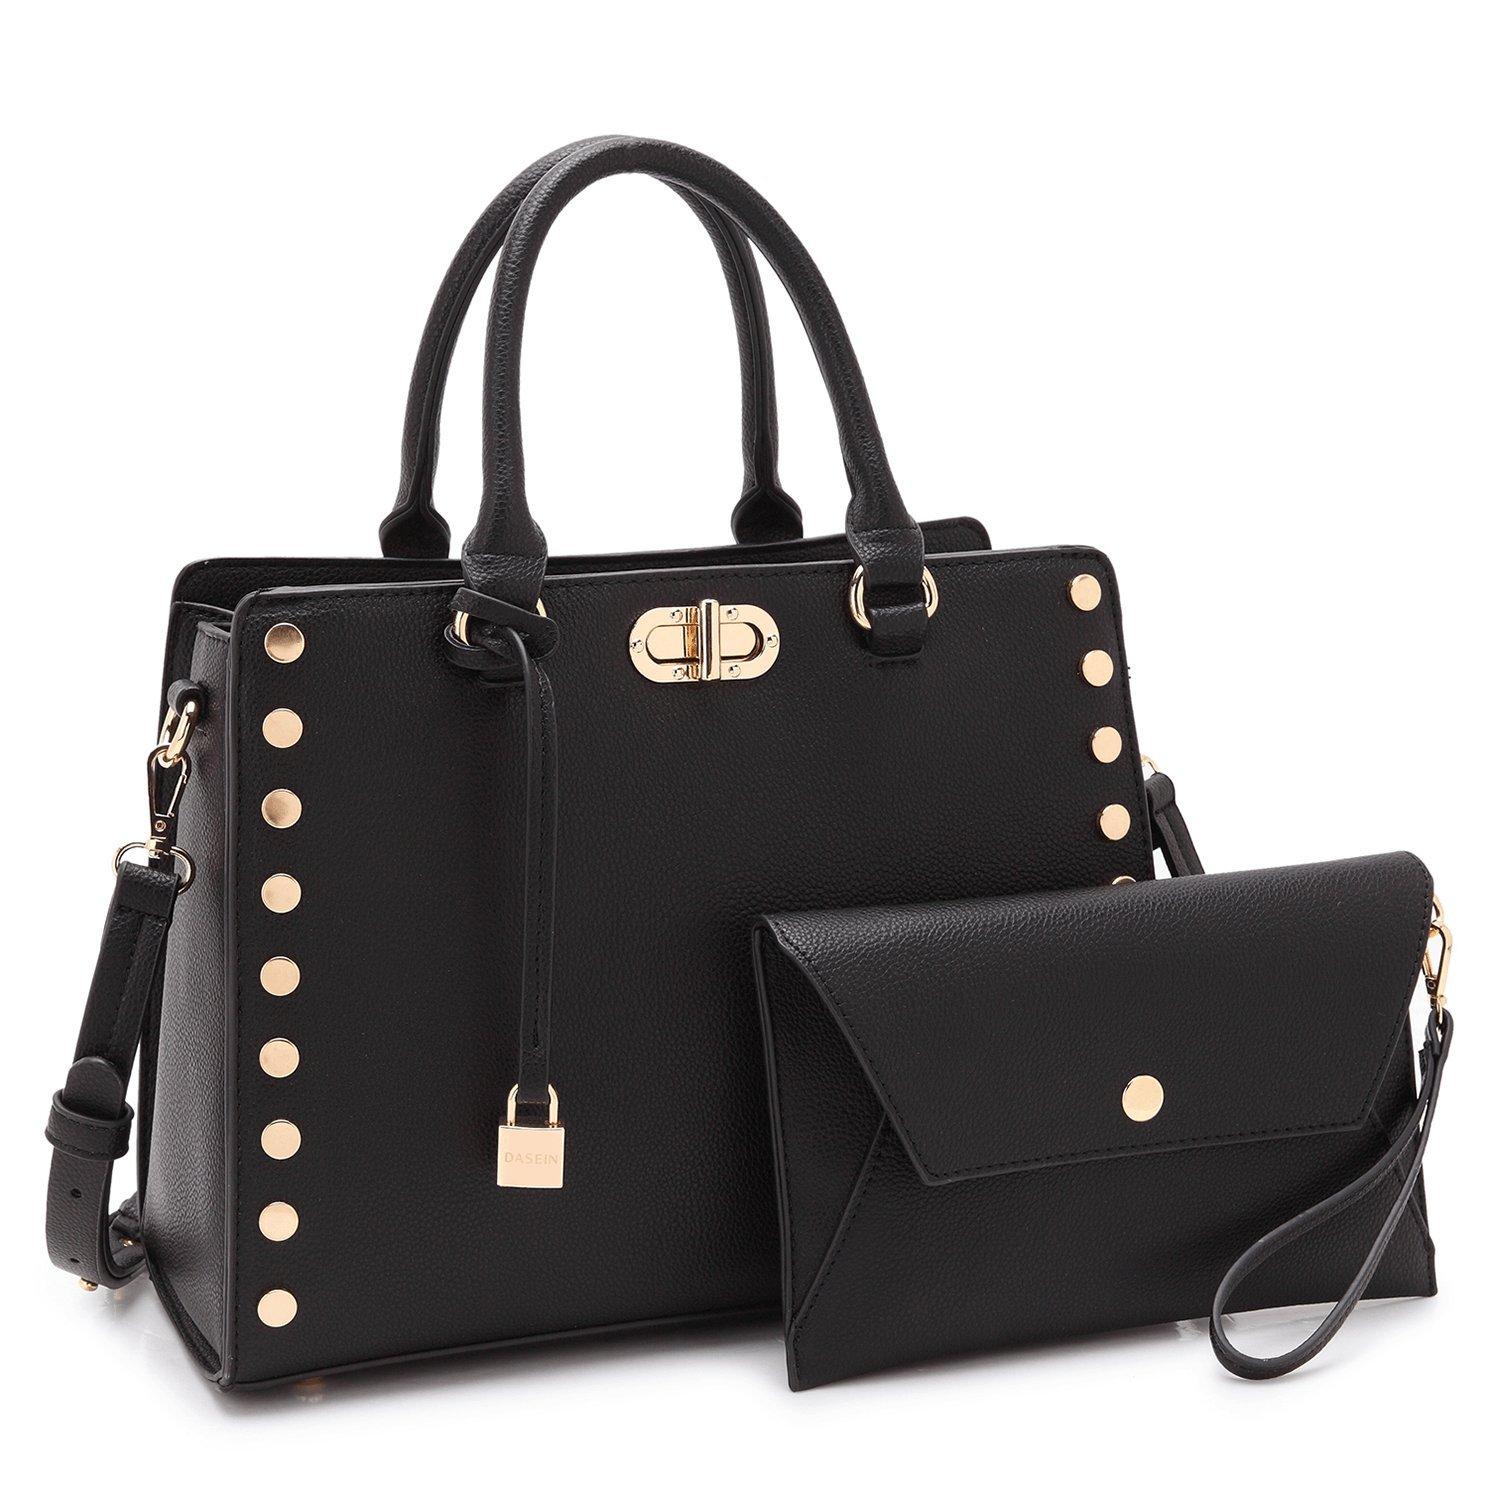 Amazon.com: Maya Karis Purse Designer Bag for Women, Twist-Lock Lady Satchel w/Pouch Teen Girl Summer Bag 7579 BK: Shoes